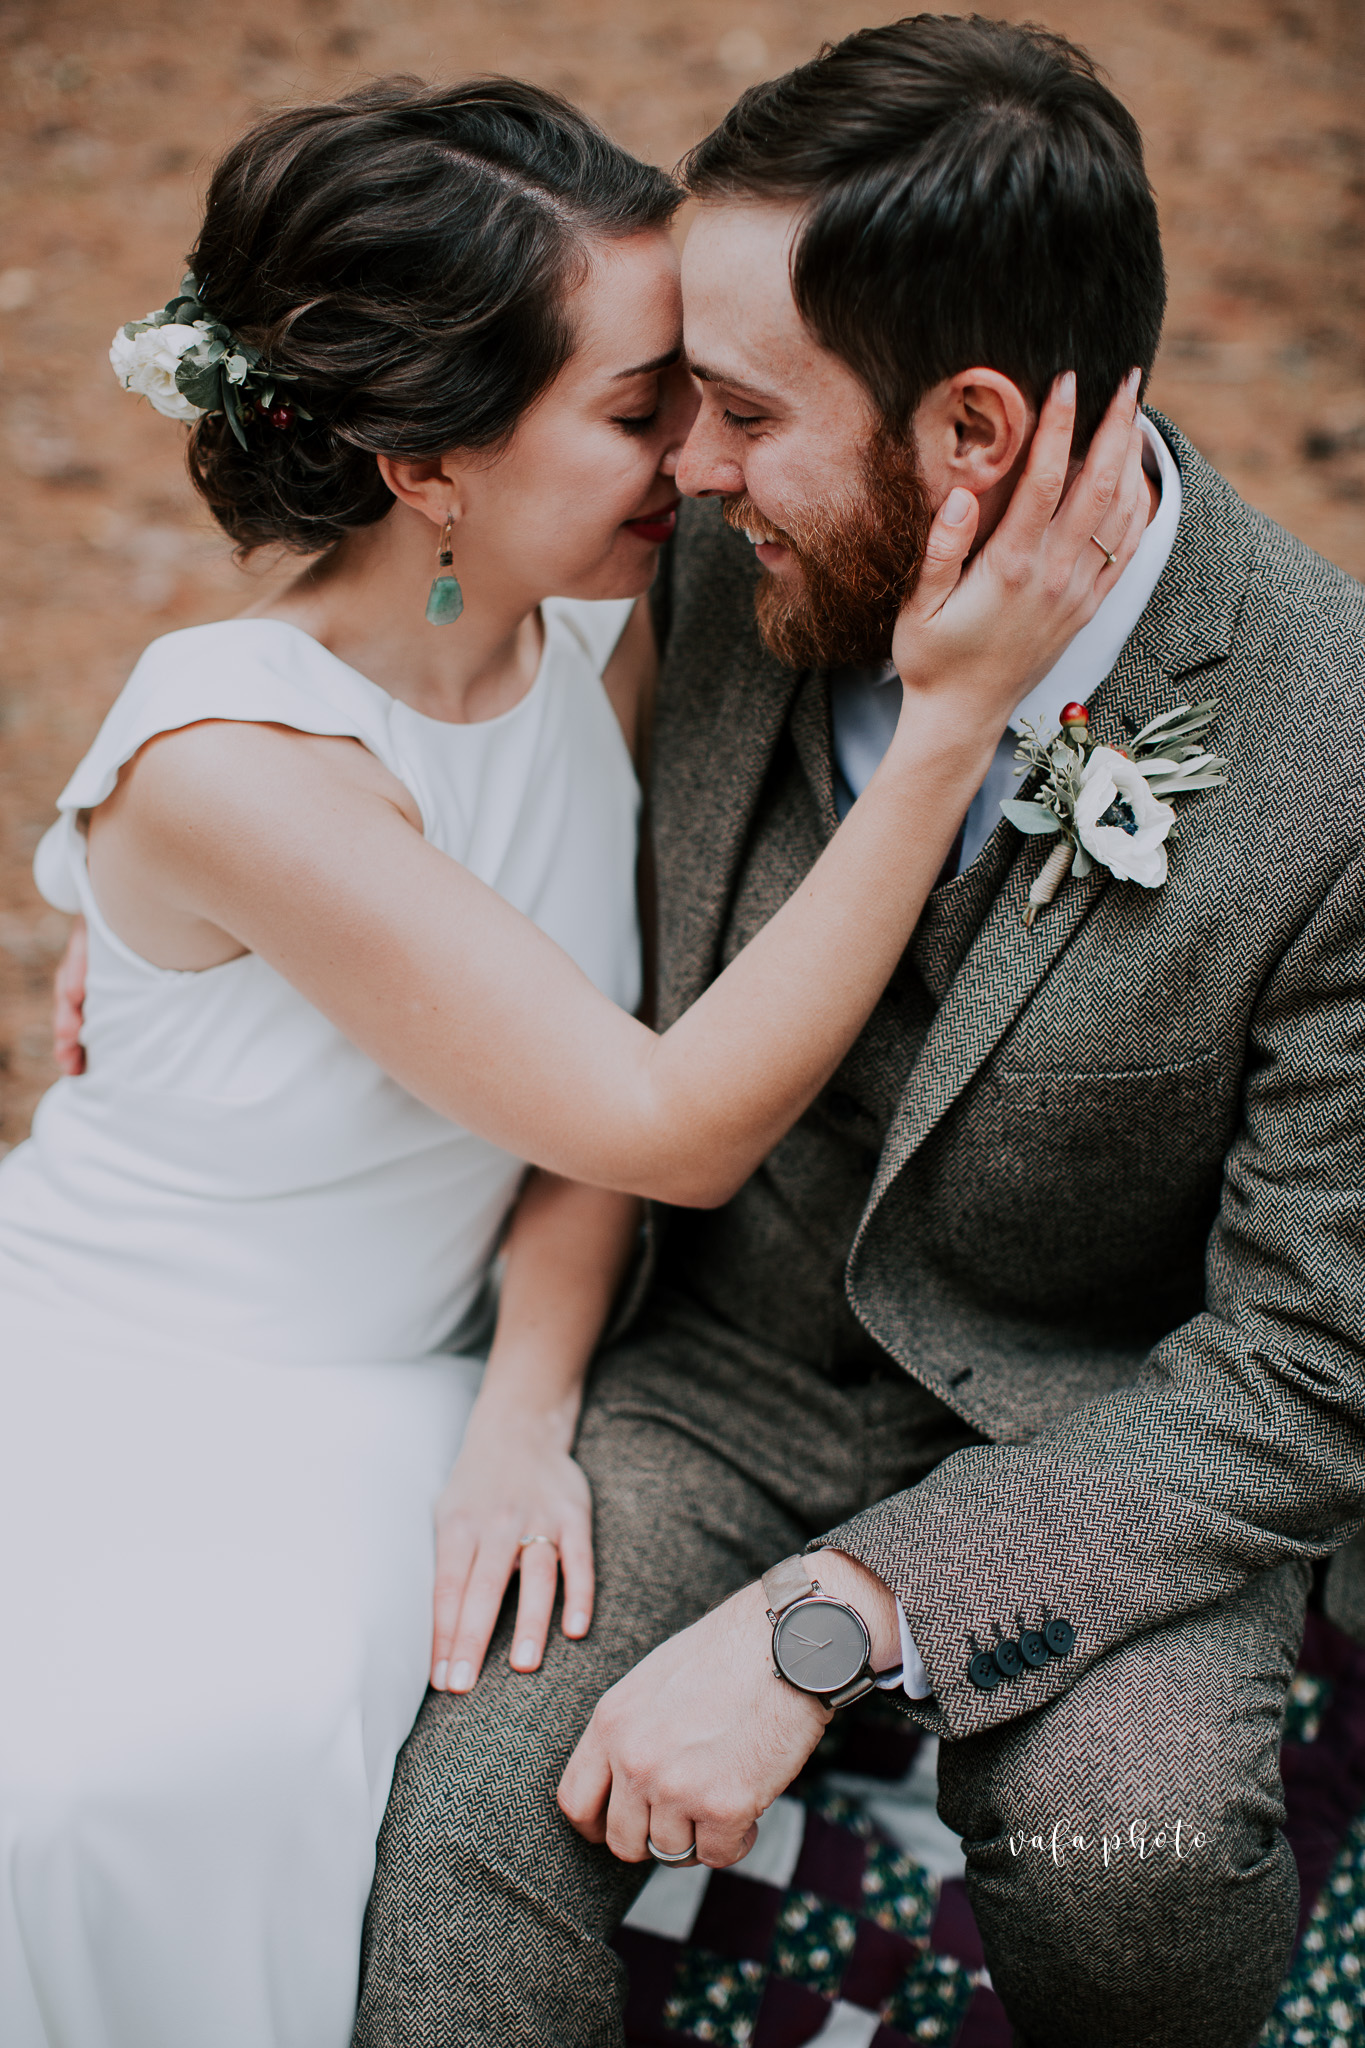 Little-Presque-Isle-Michigan-Wedding-Kim-Kyle-Vafa-Photo-415.jpg